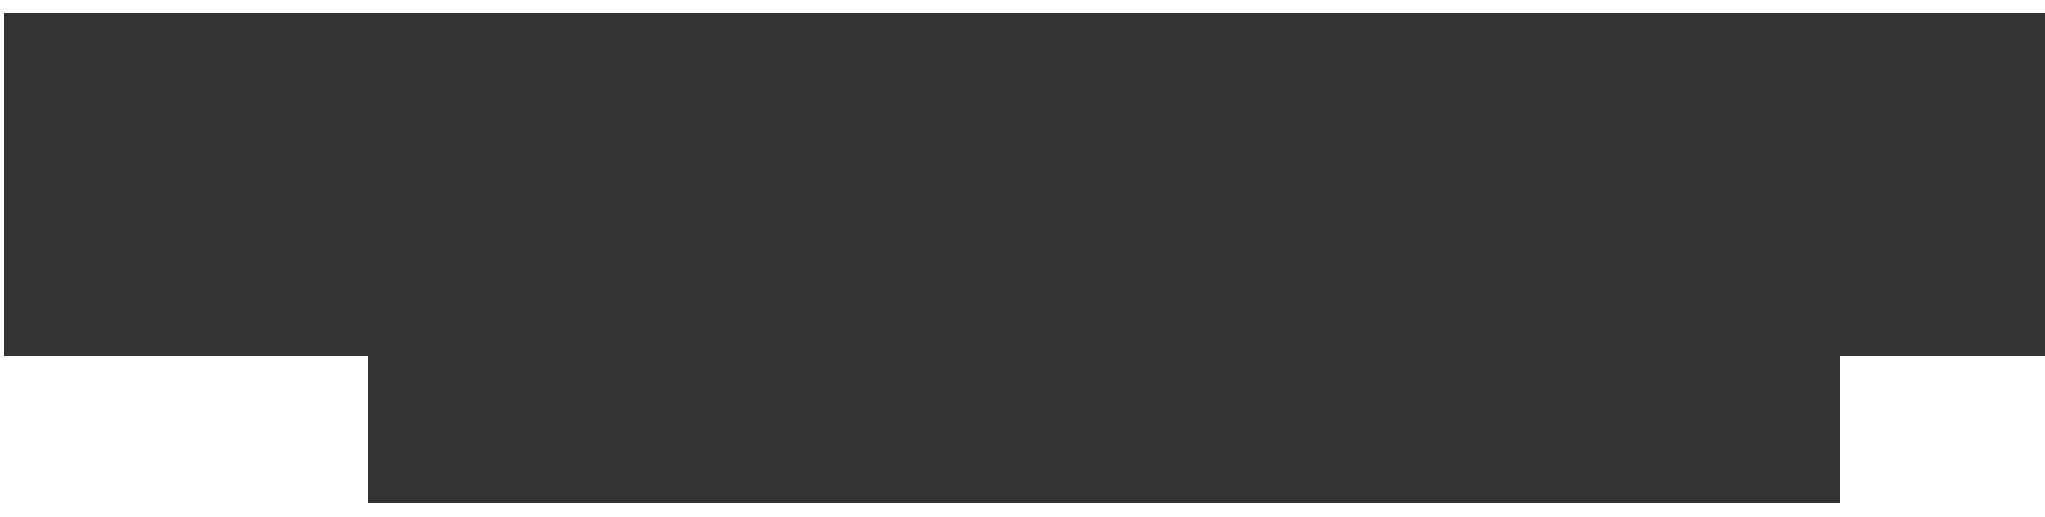 Jacobelli Liquori